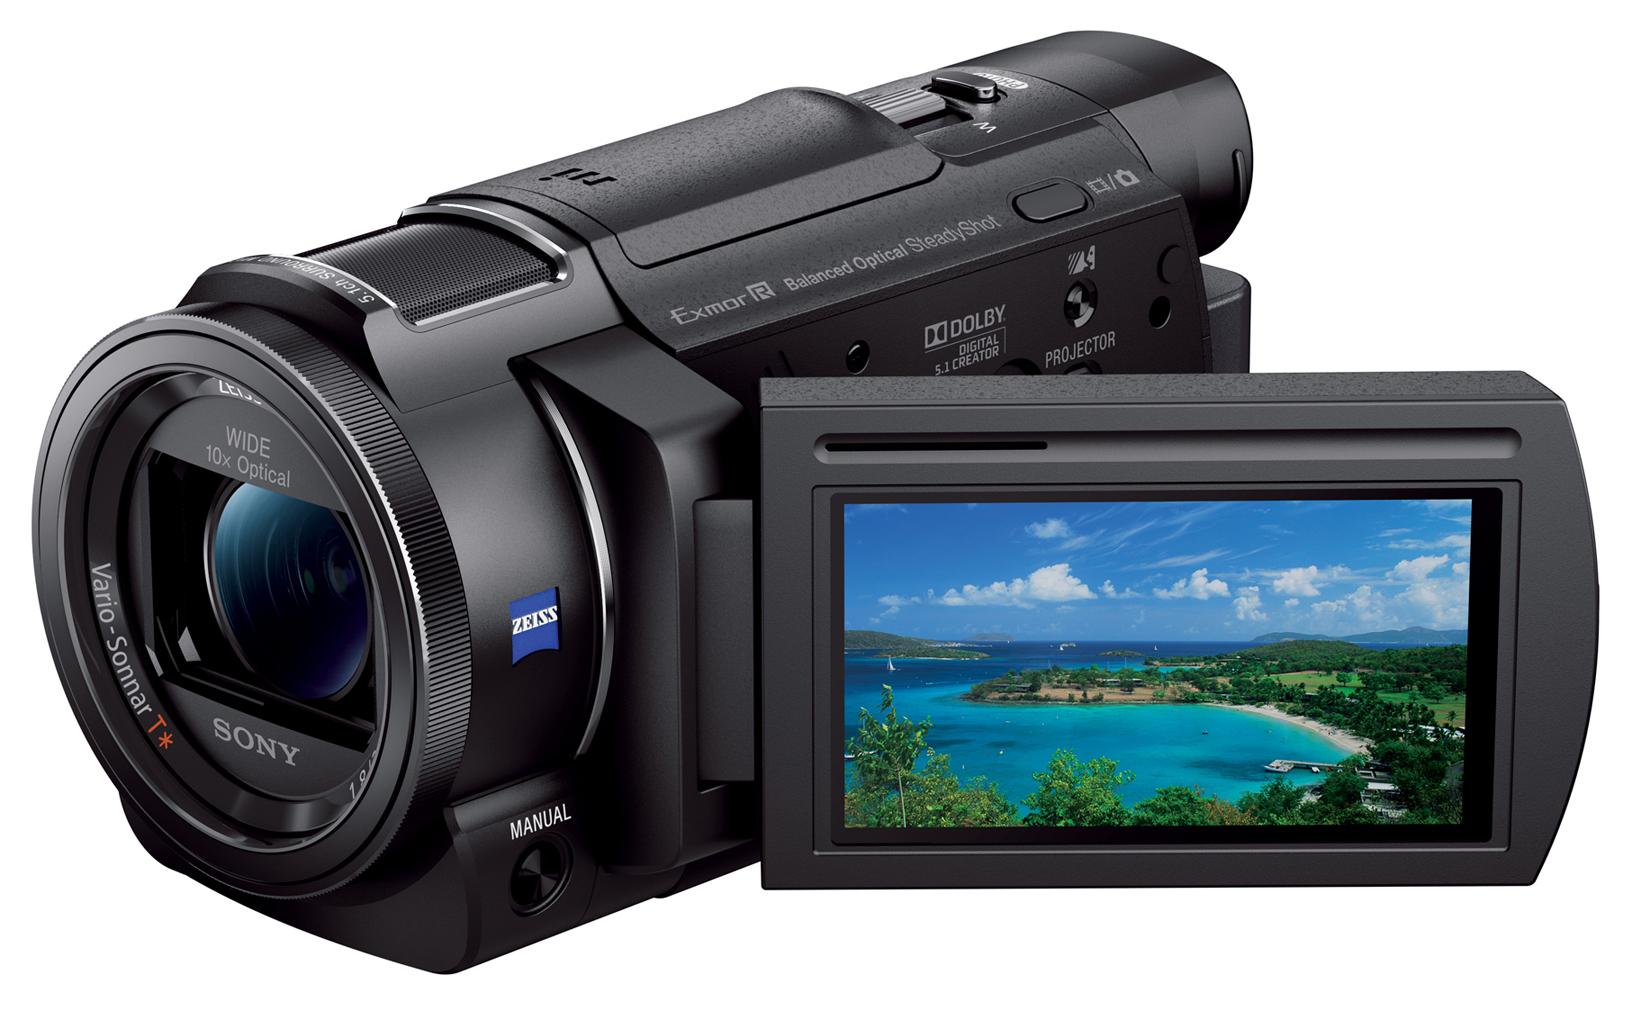 beste kwaliteit video formaat